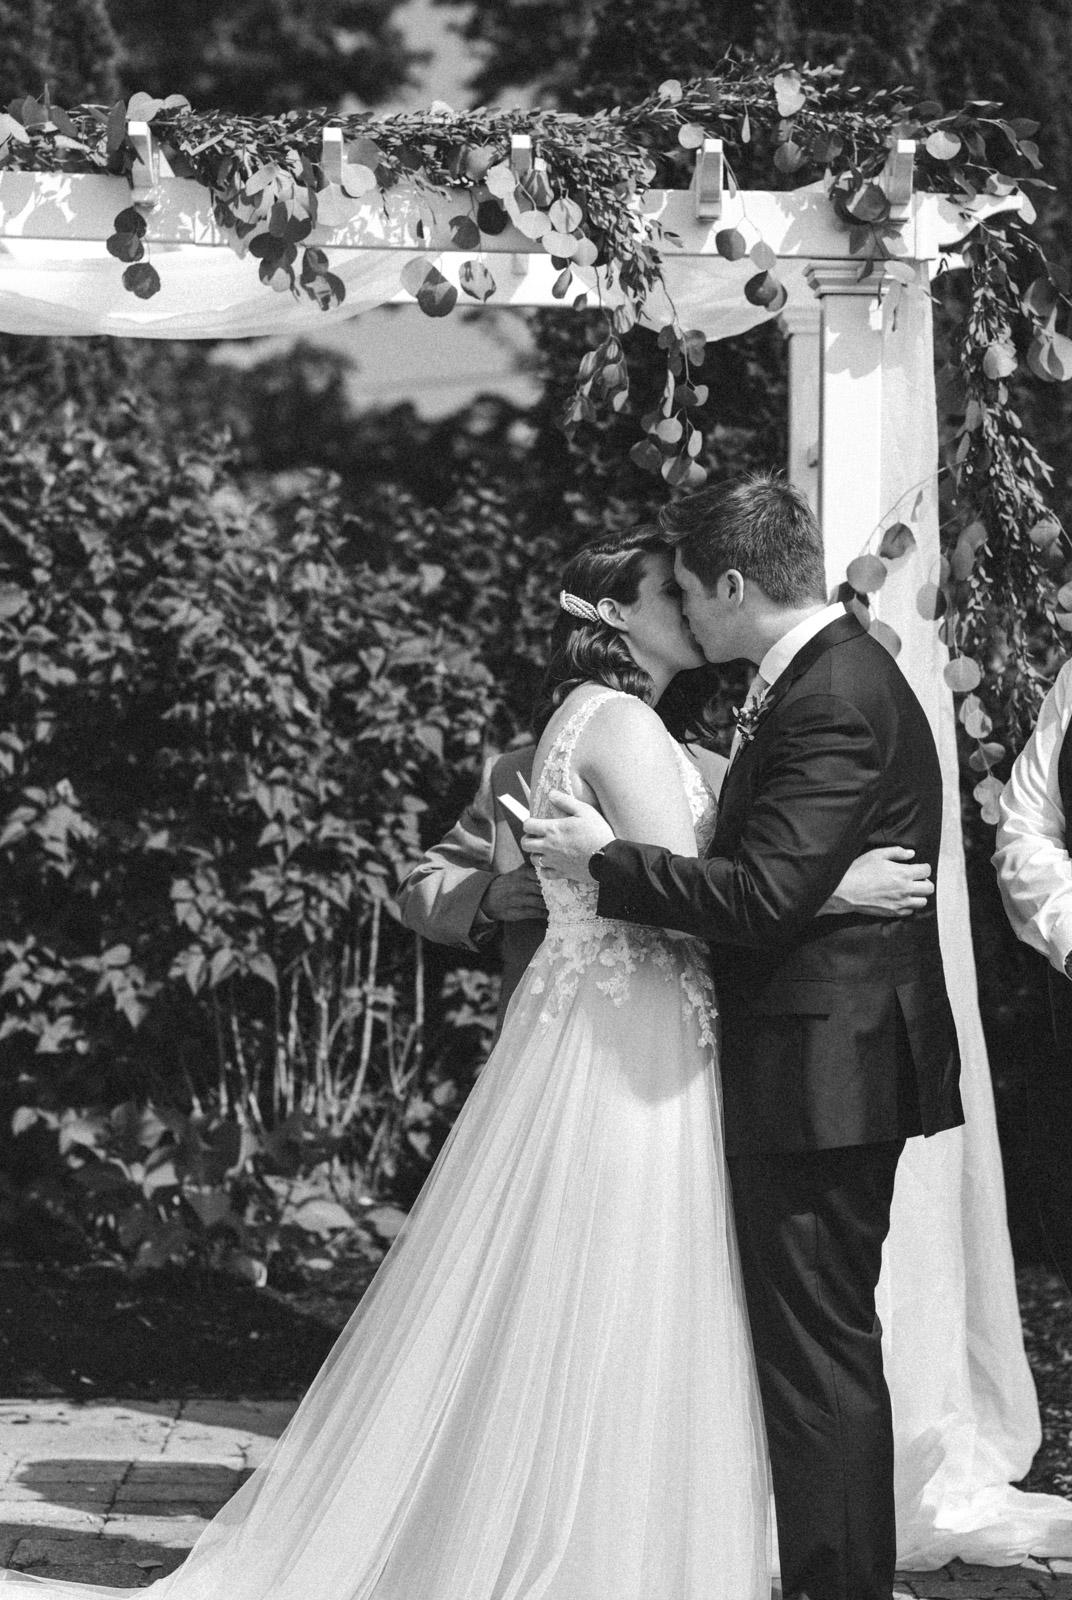 Emerson & Elicia's Golf Course Wedding Aidan & Leanne Hennebry Hamilton Wedding Videographers Photographers Niagara Hush Hush Photography & Film-24.jpg